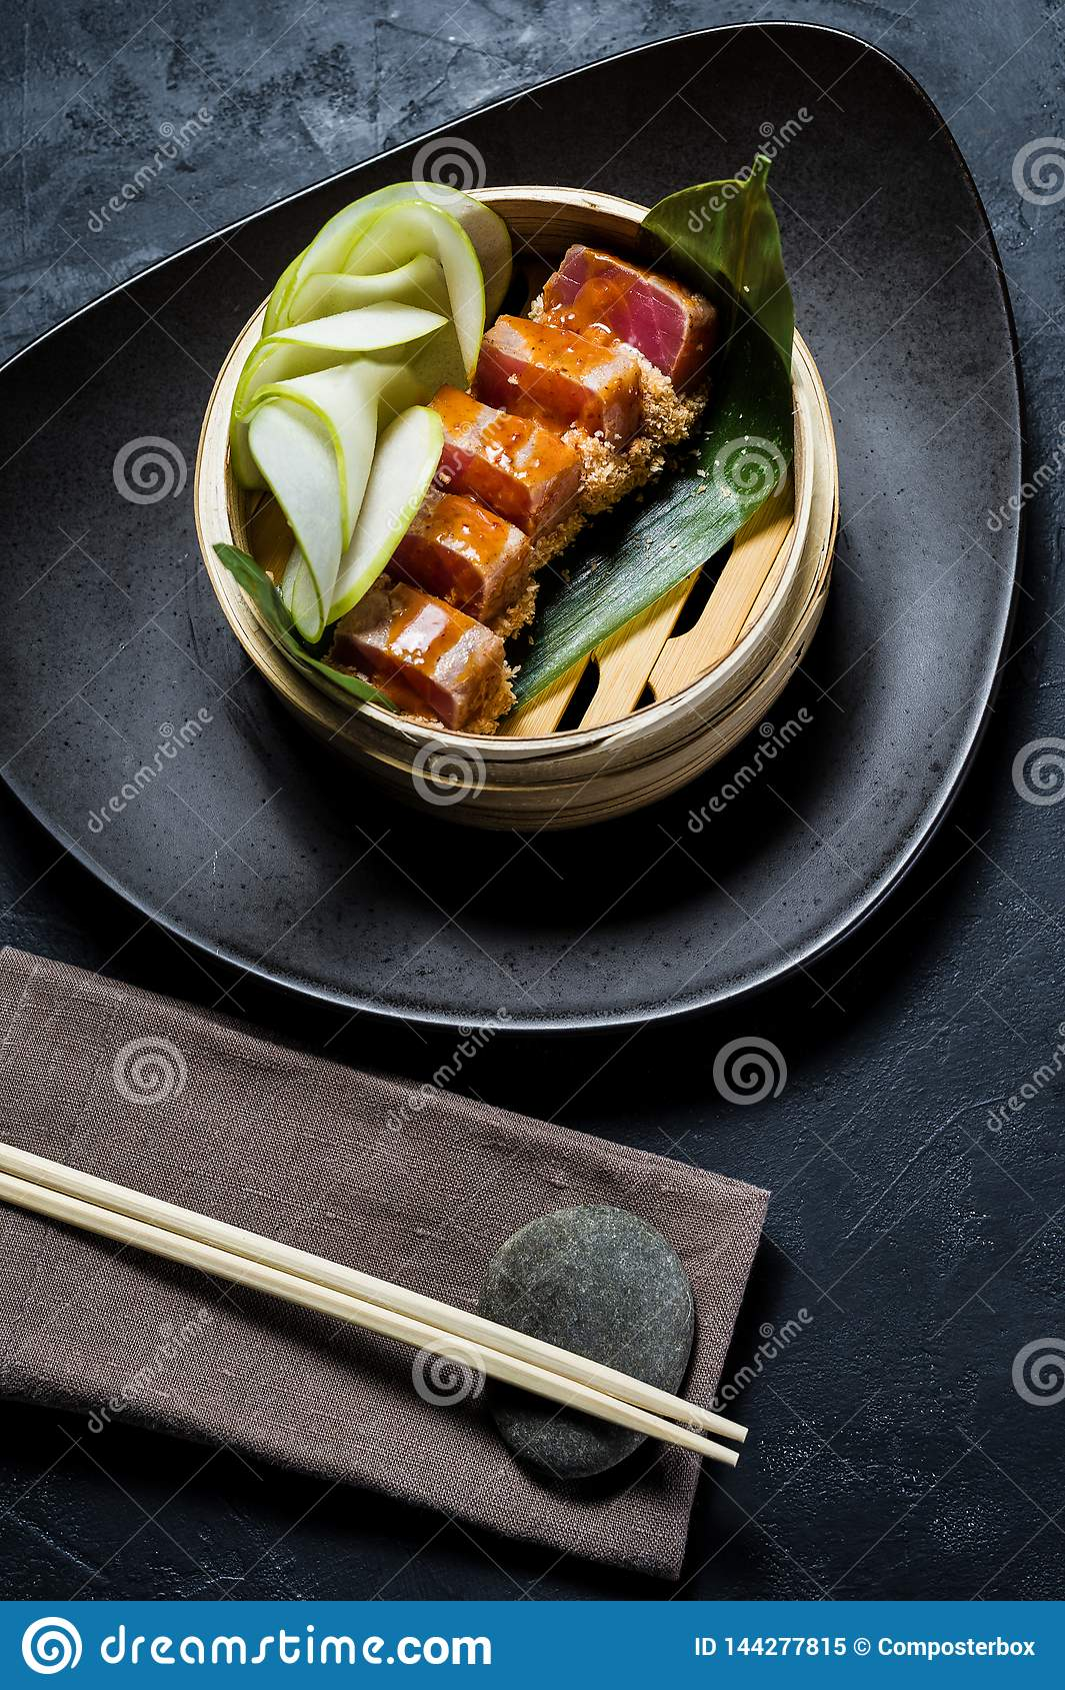 Japanese tuna sashimi, dark background, top view.